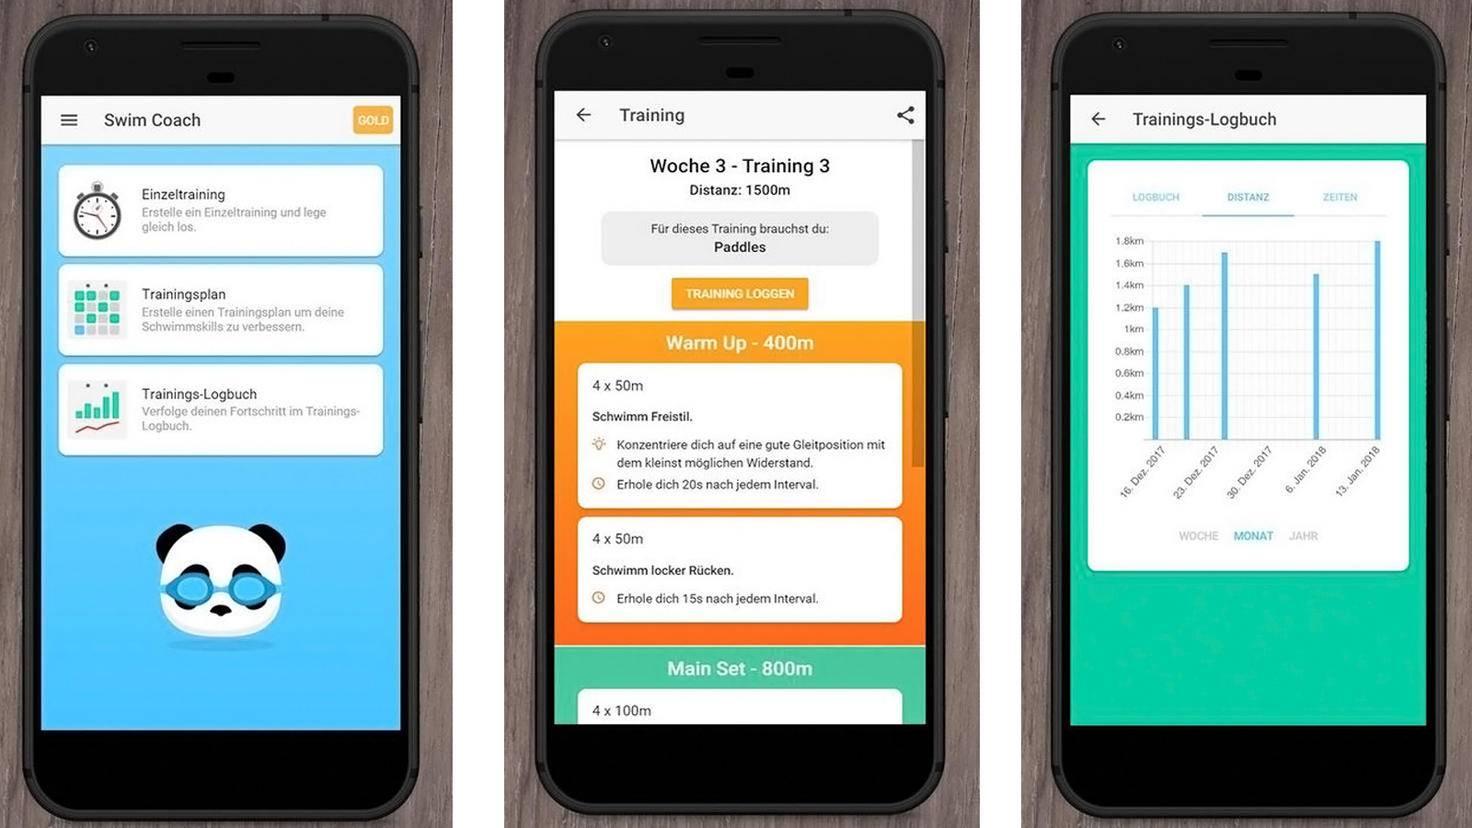 Swim Coach-App-Google Play Store-Reto Kaul